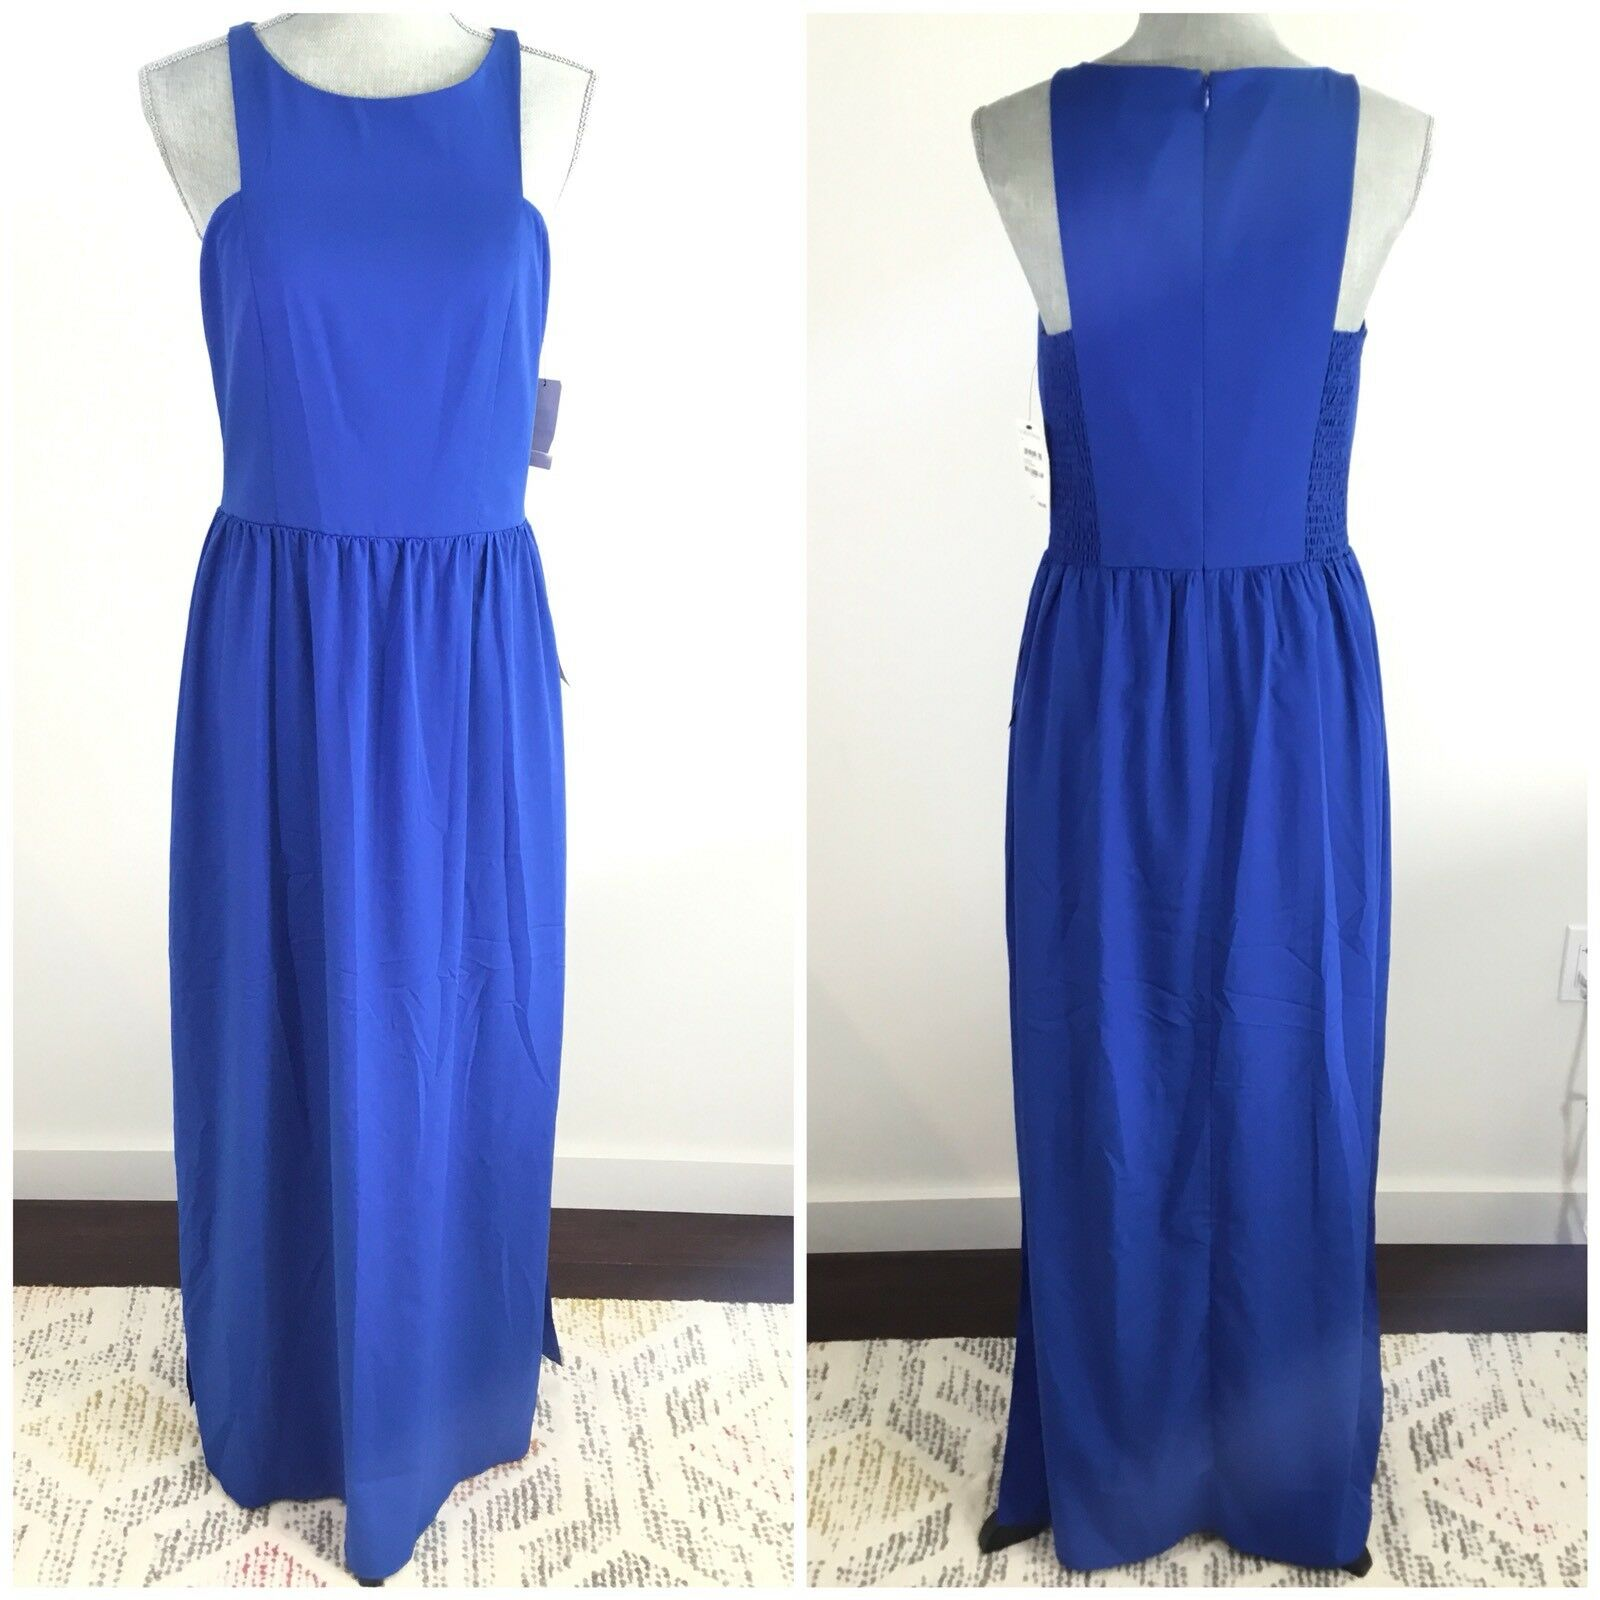 ce6566bdd127 CHELSEA28 Size 10 Cutaway Shoulder Maxi Cobalt bluee Dress Long Nordstrom